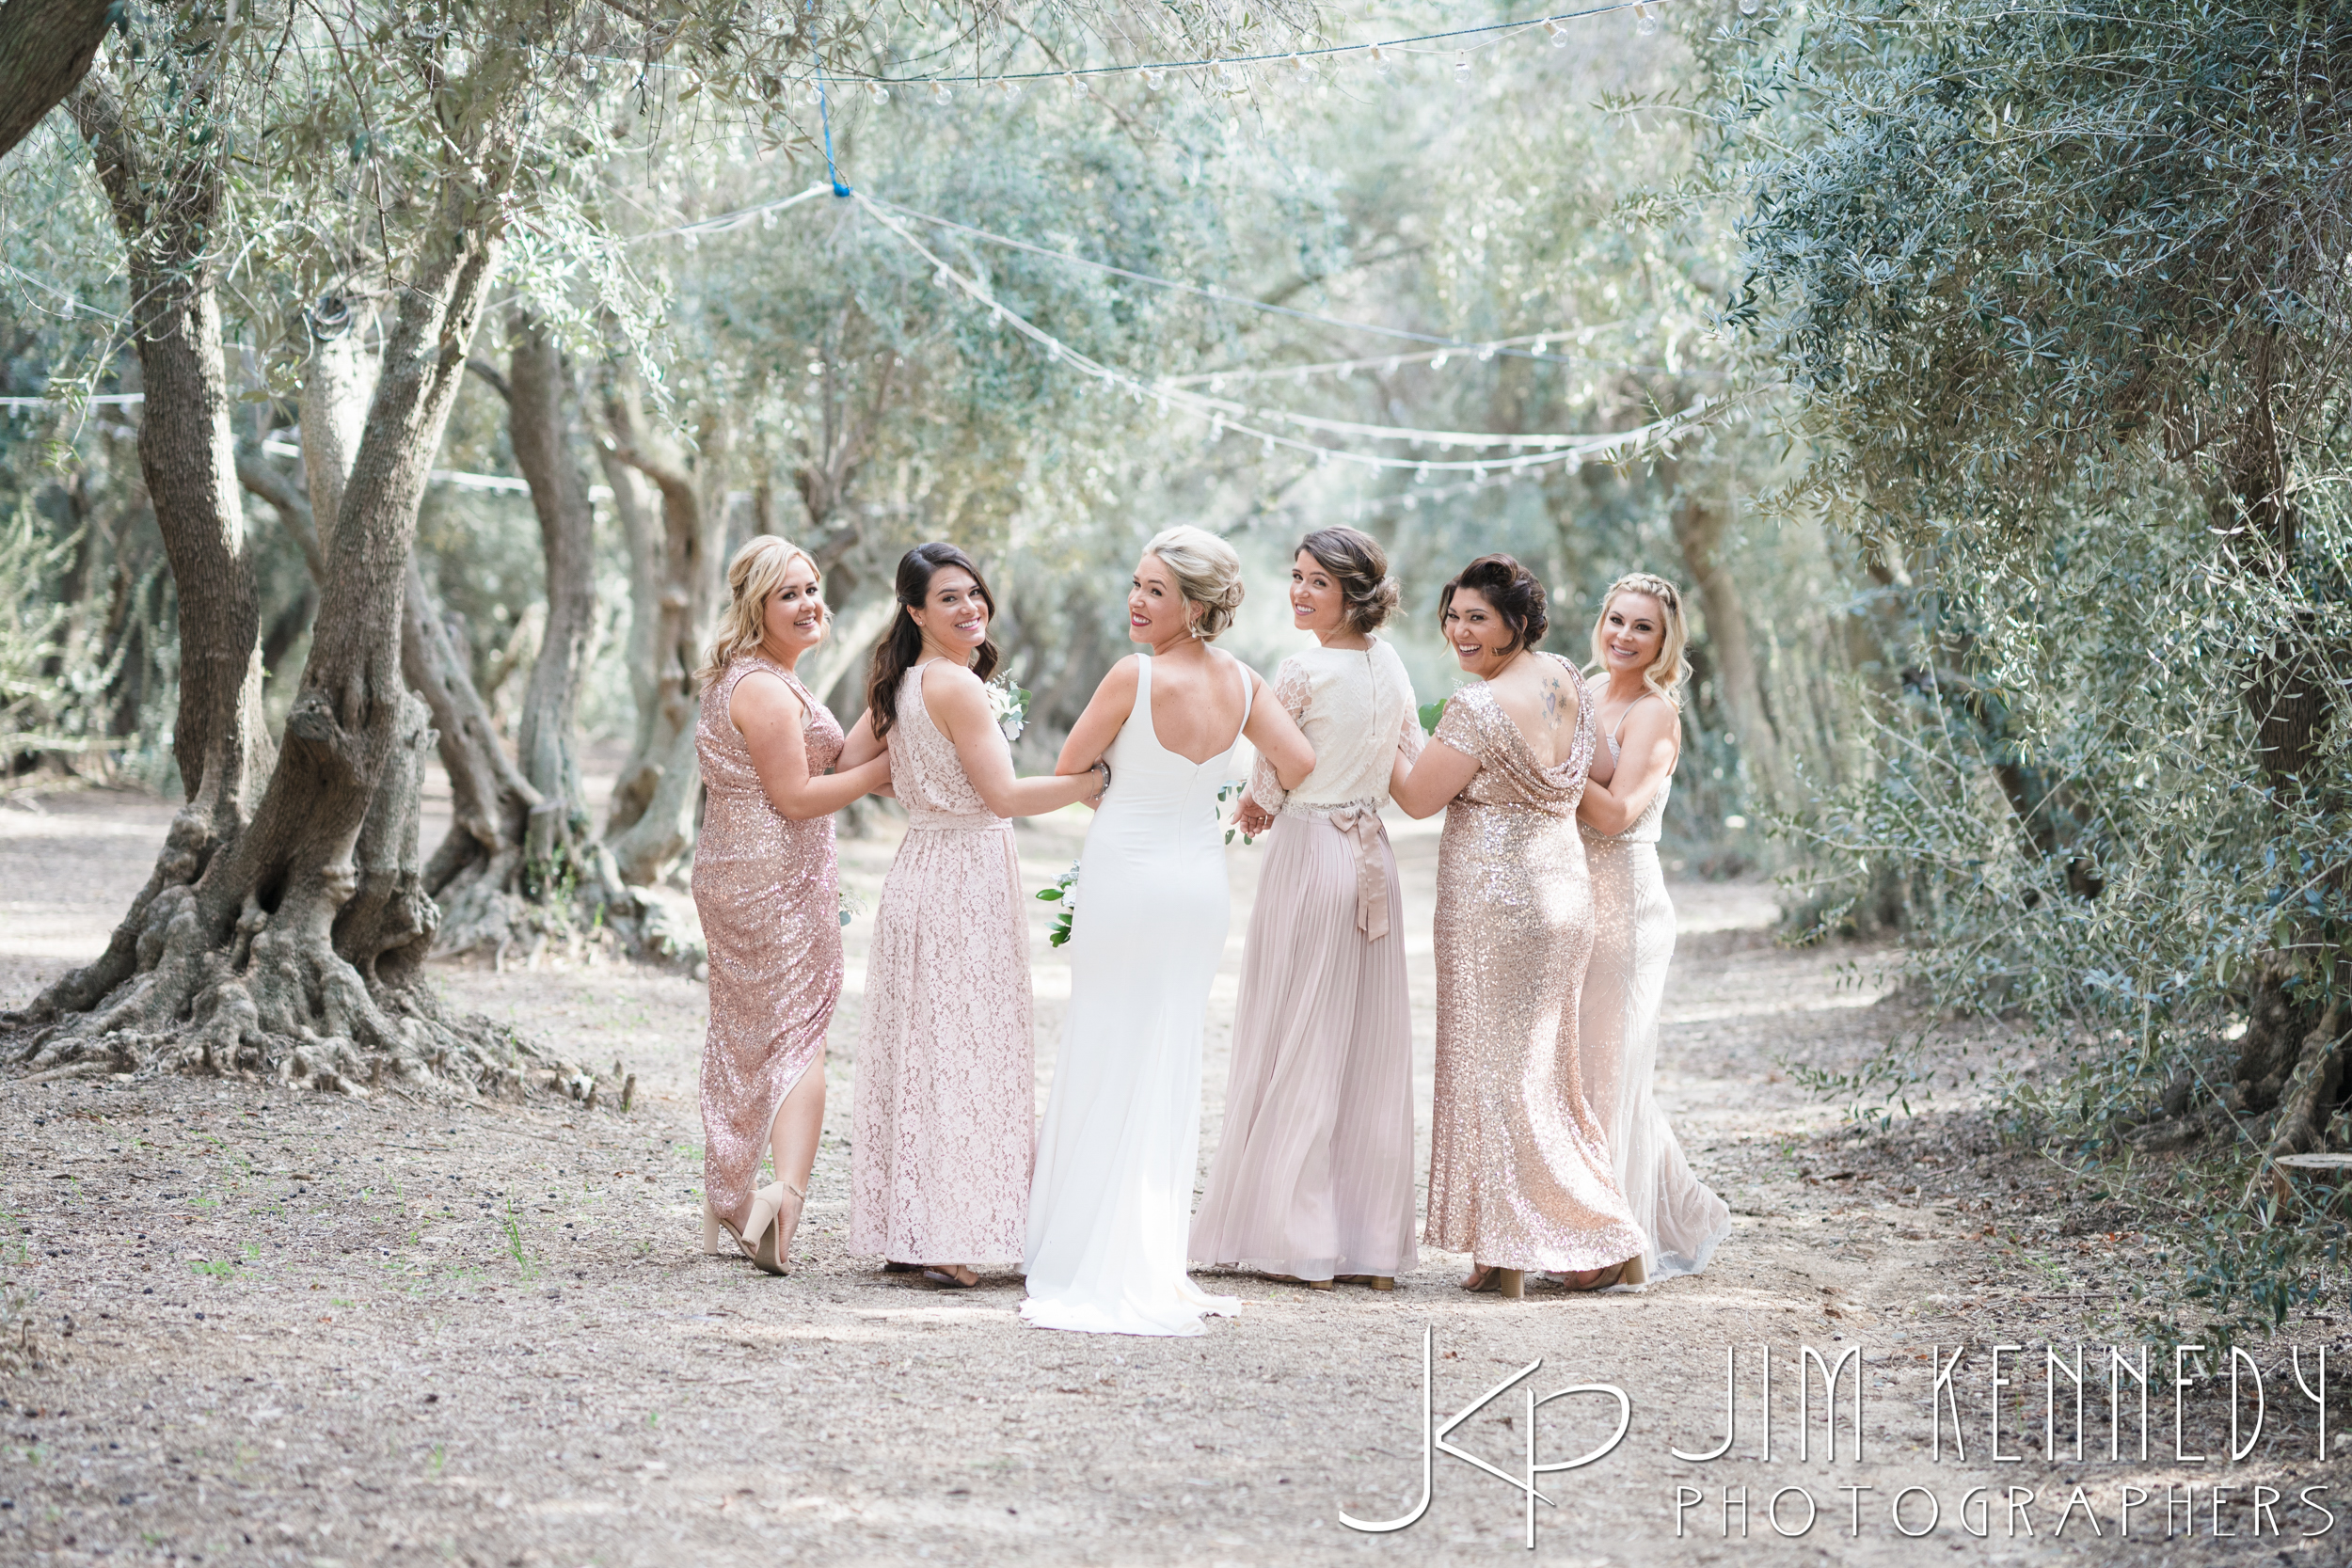 jim_kennedy_photographers_highland_springs_wedding_caitlyn_0073.jpg